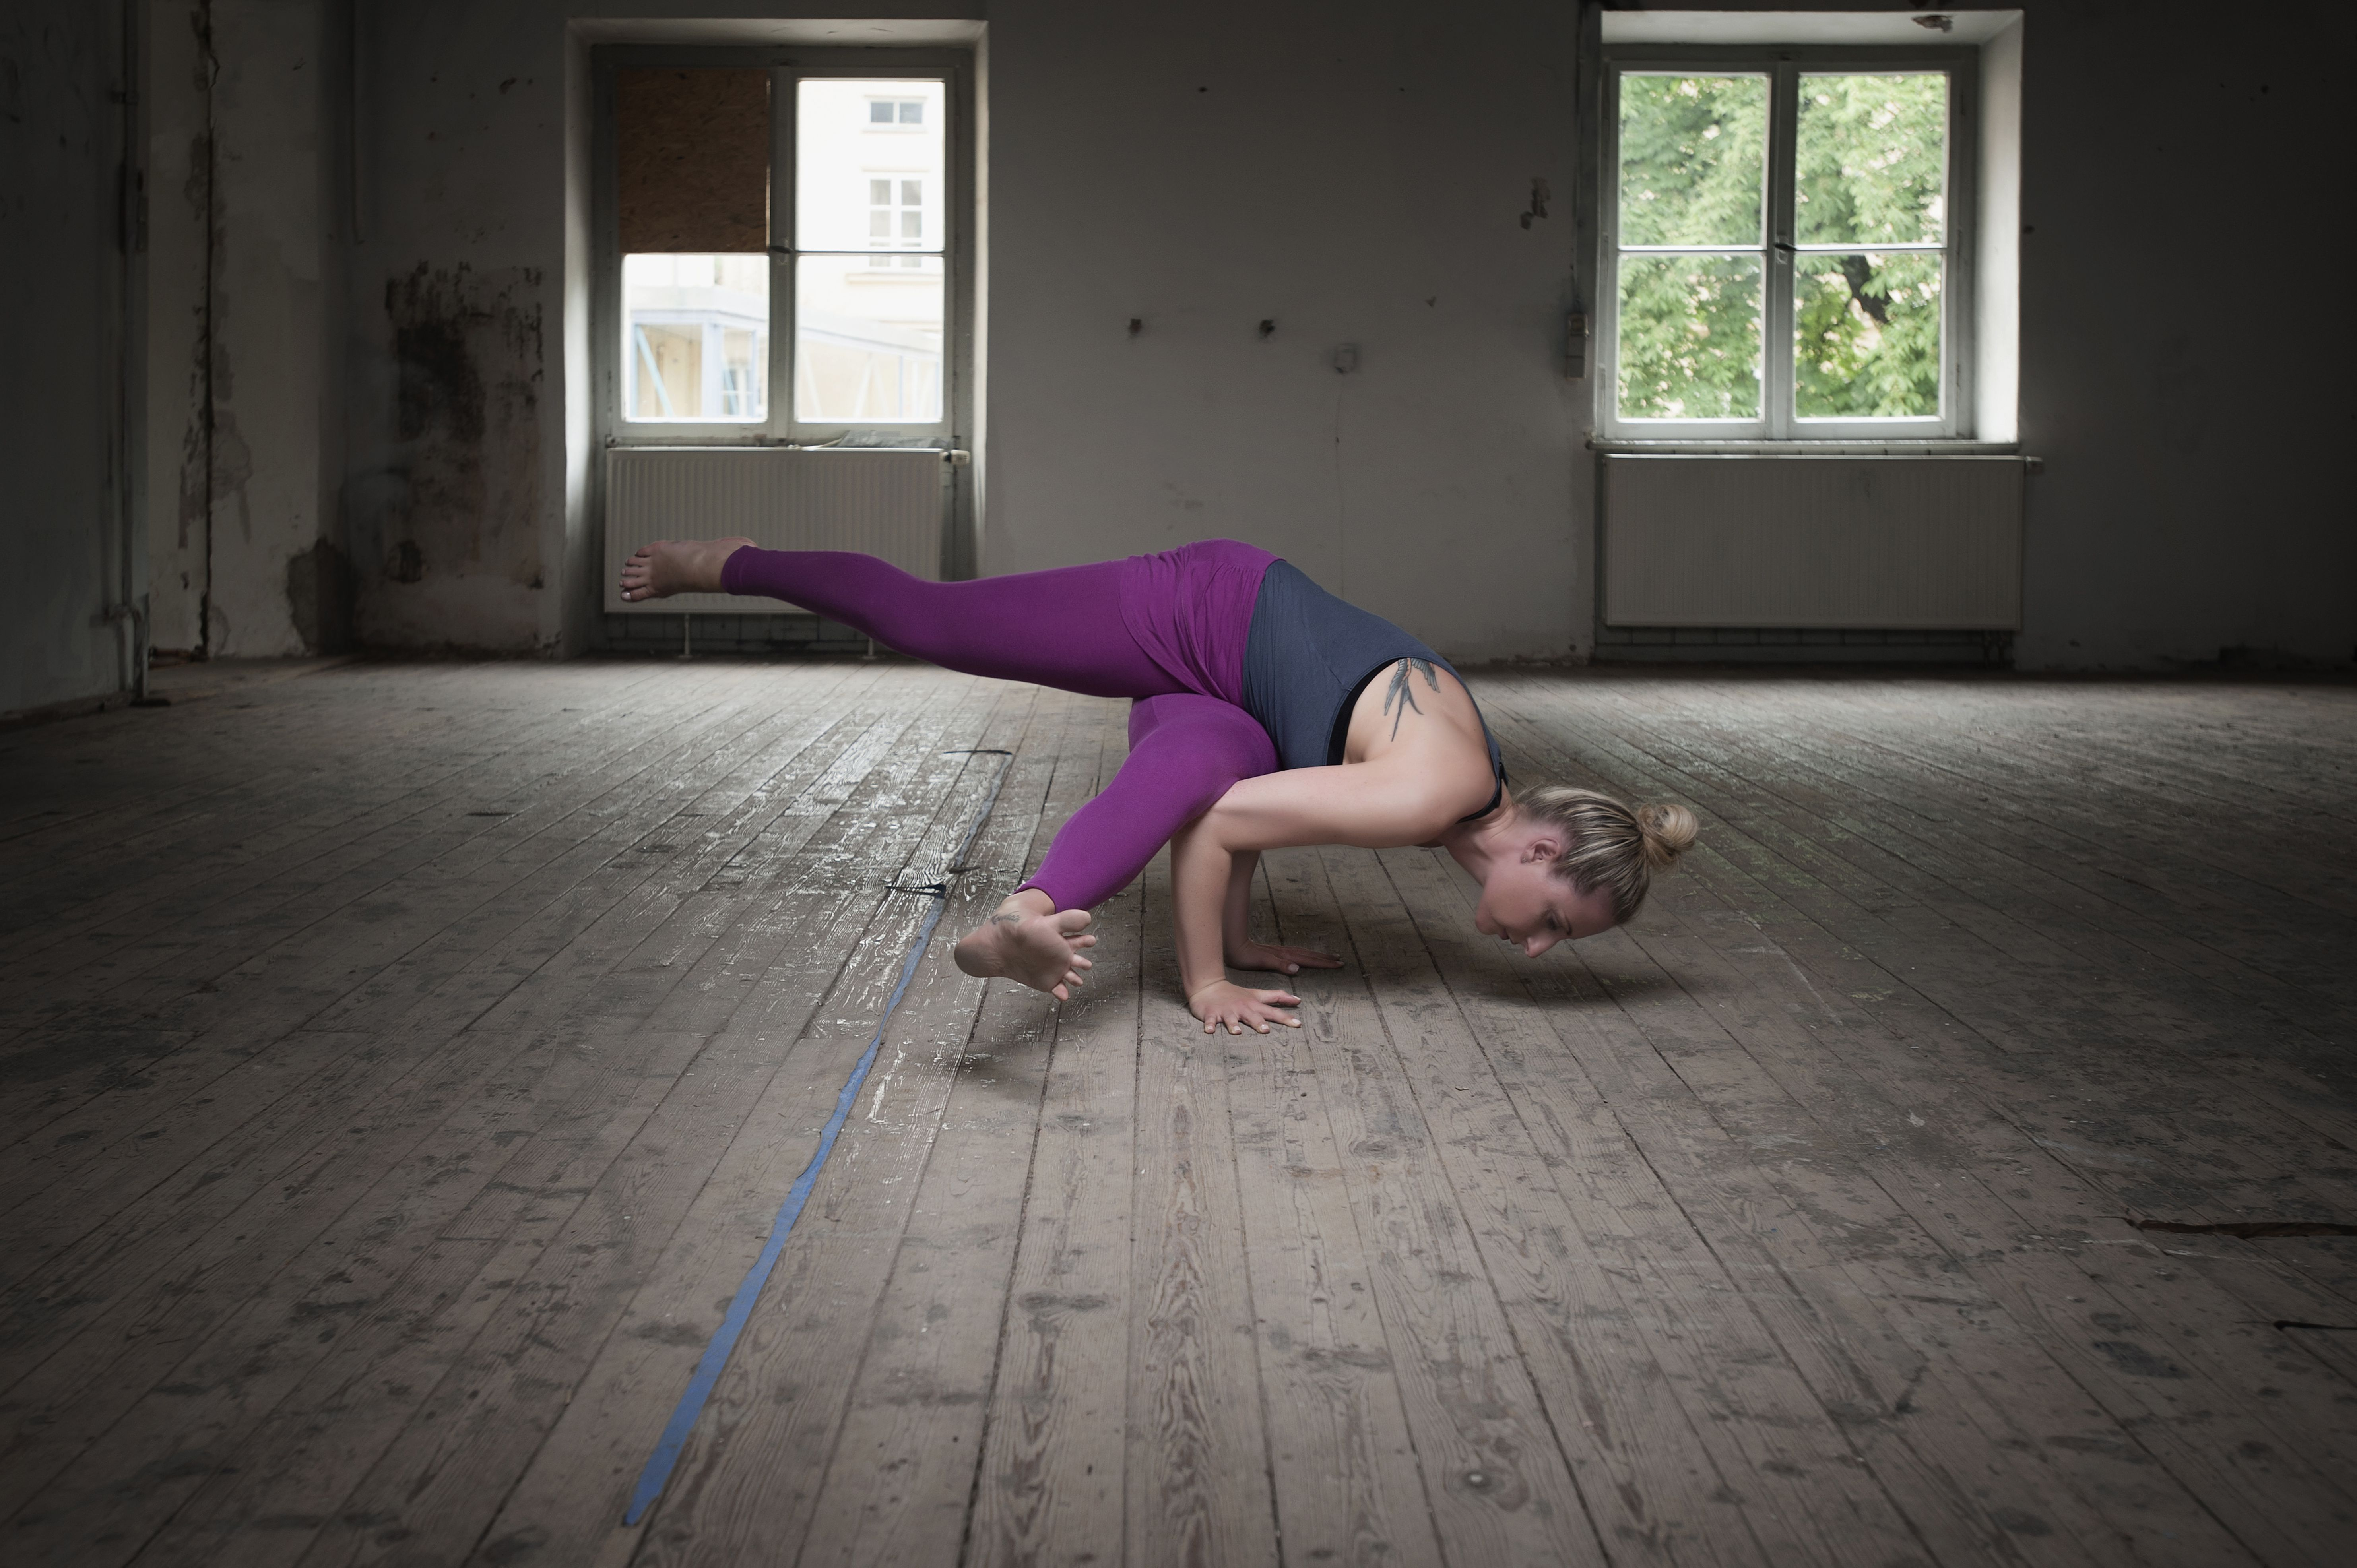 Woma in eka pada koundinyasana I yoga pose.